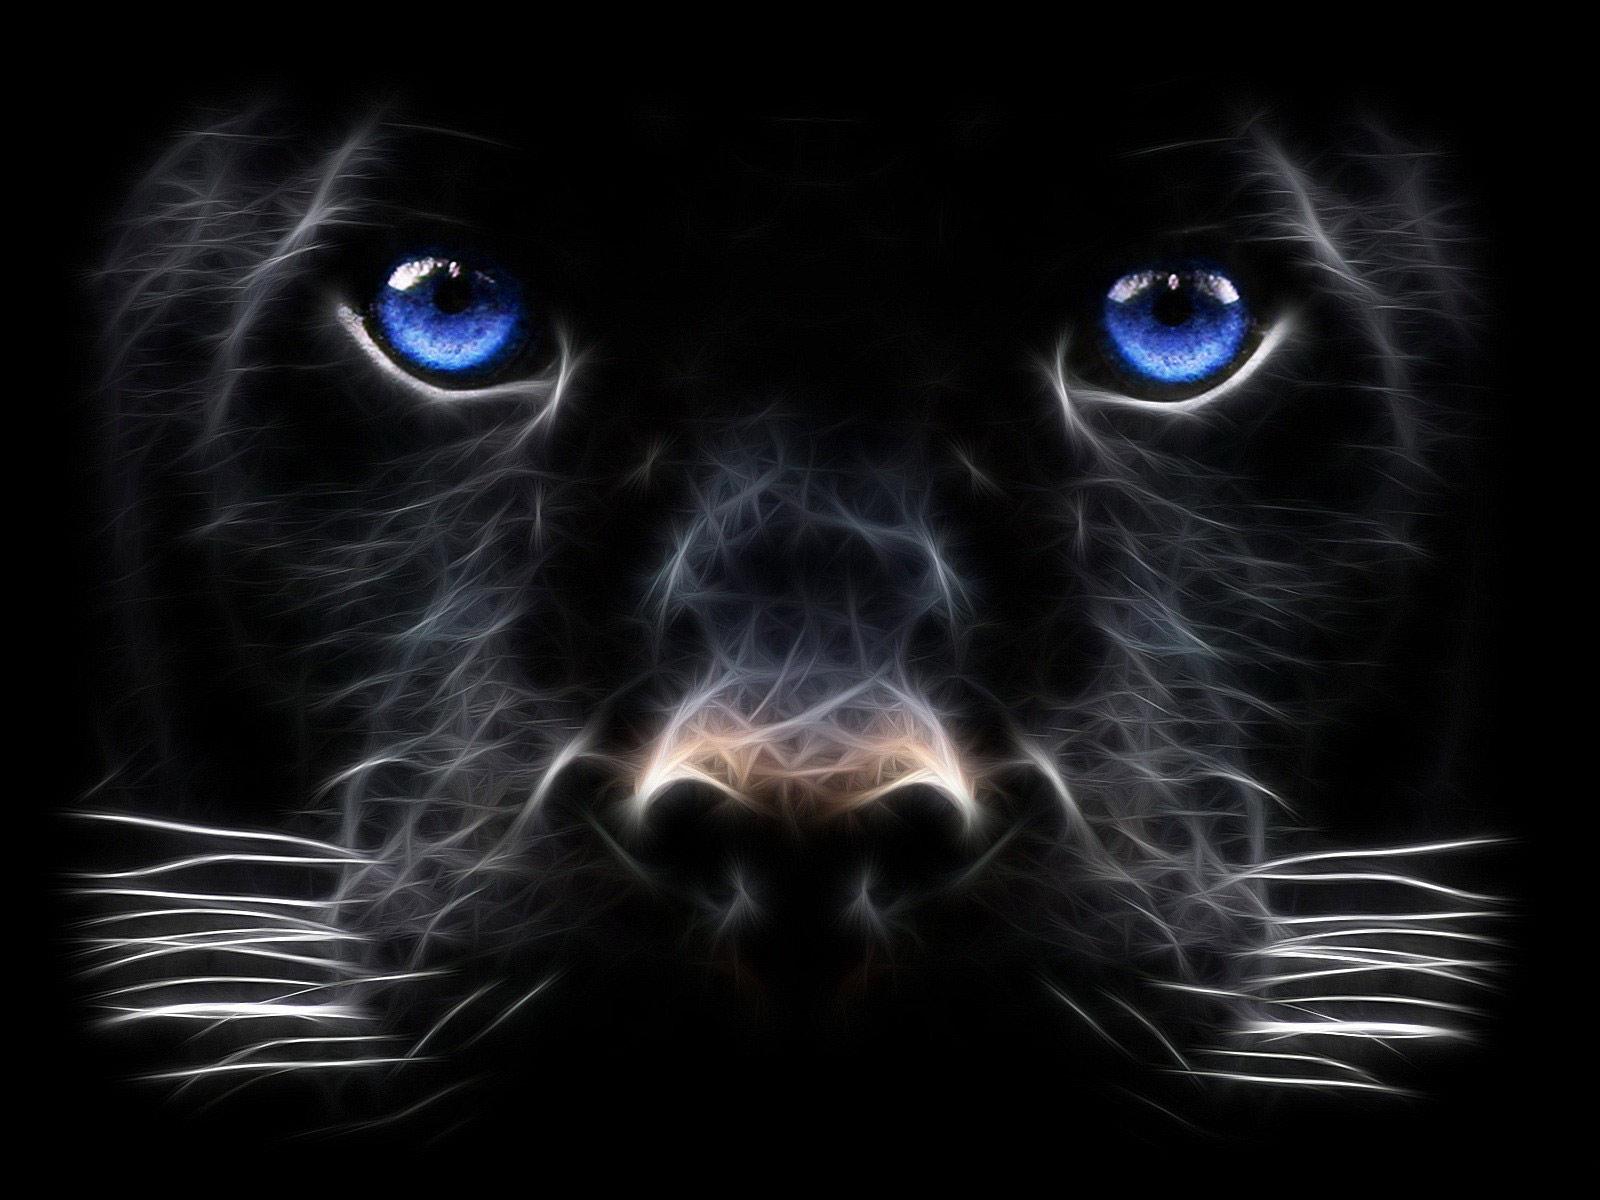 Big Cat Hd Wallpapers Download Wallpaper DaWallpaperz 1600x1200